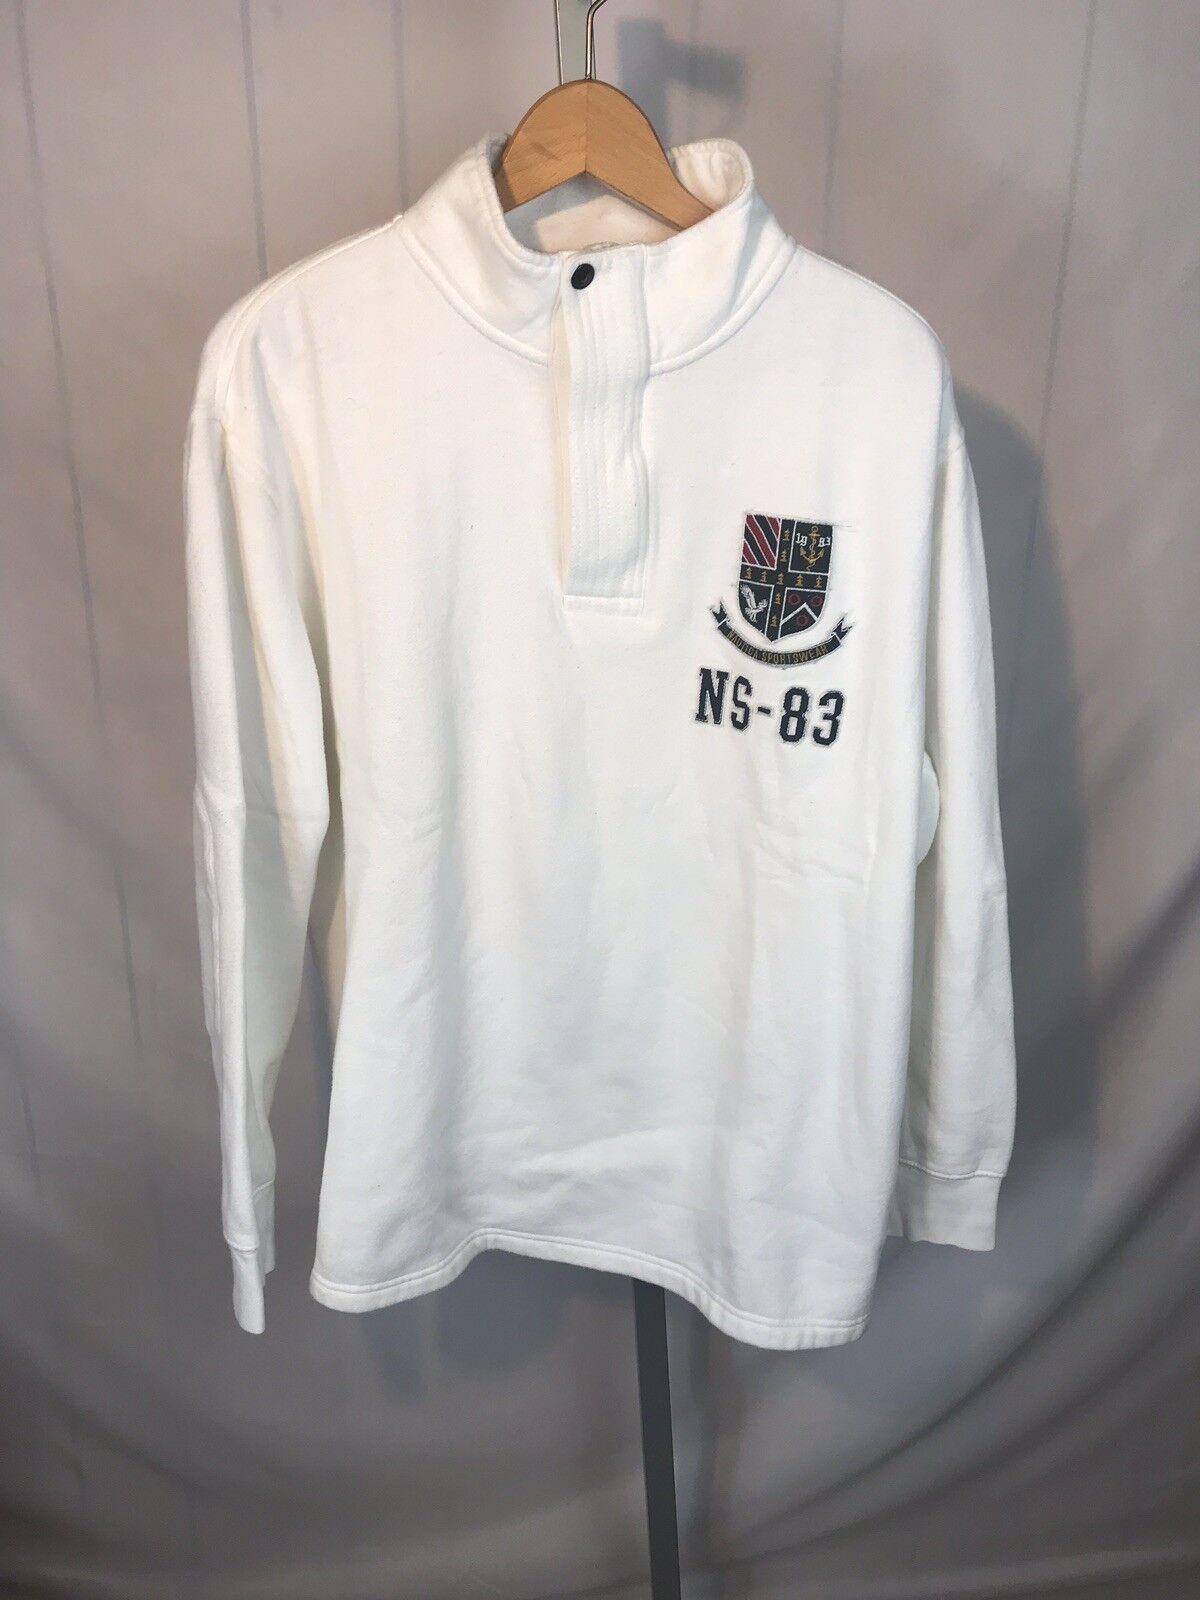 NAUTICA Sportswear Sweater 1 4 Zip PATCH White Crest Patches Sz XL NS-83 (AU)